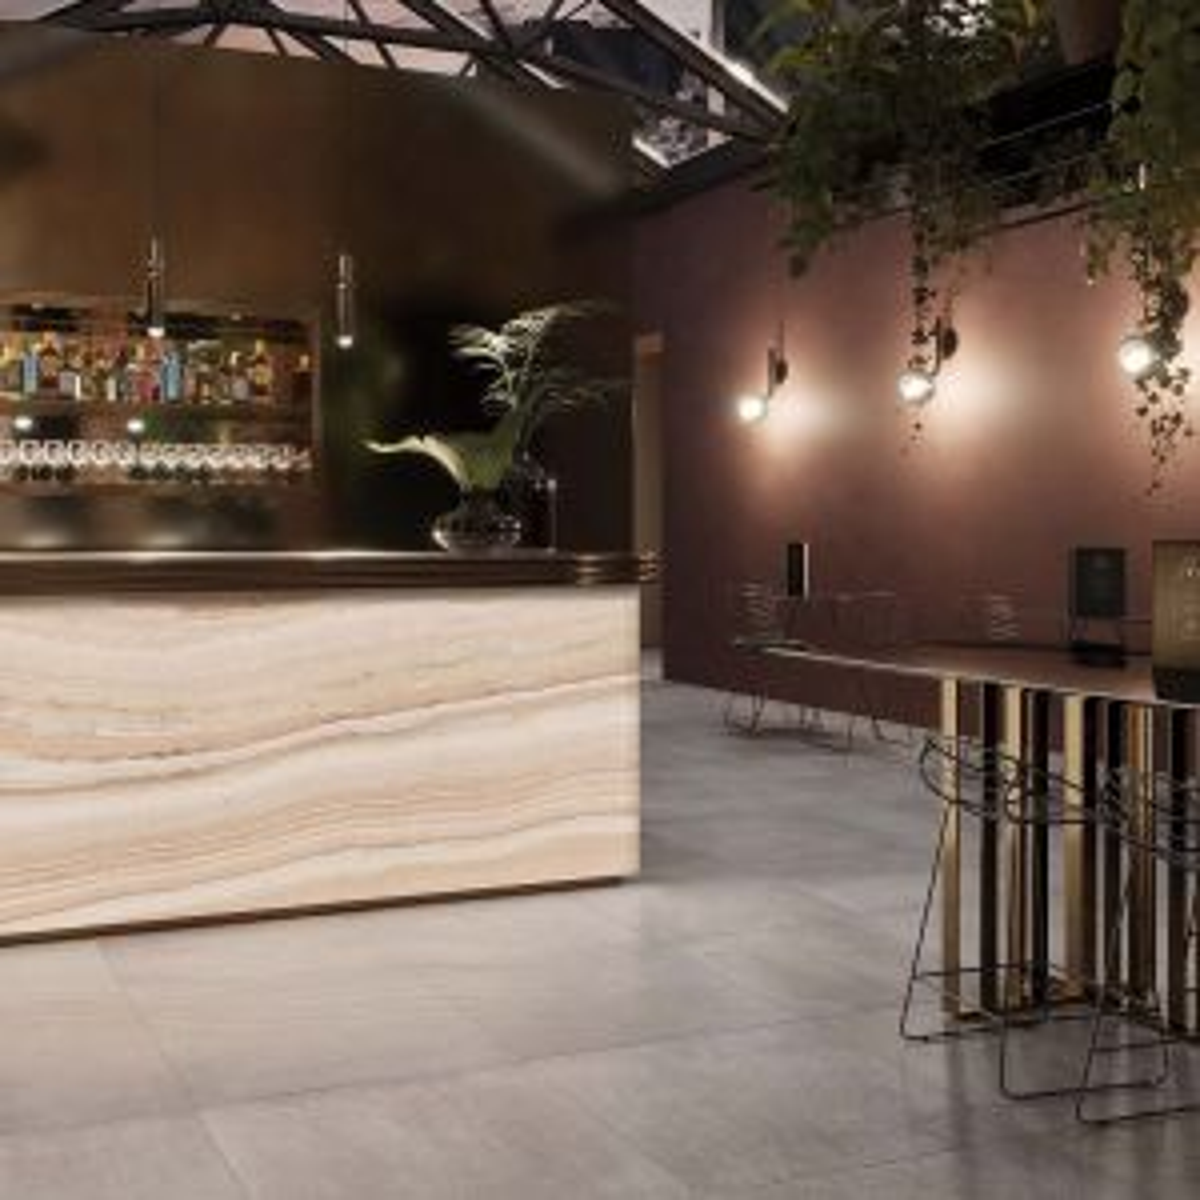 RAK Luce Translucent Onyx Ivory Full Lappato Tile 1200 x 2600mm Lifestyle